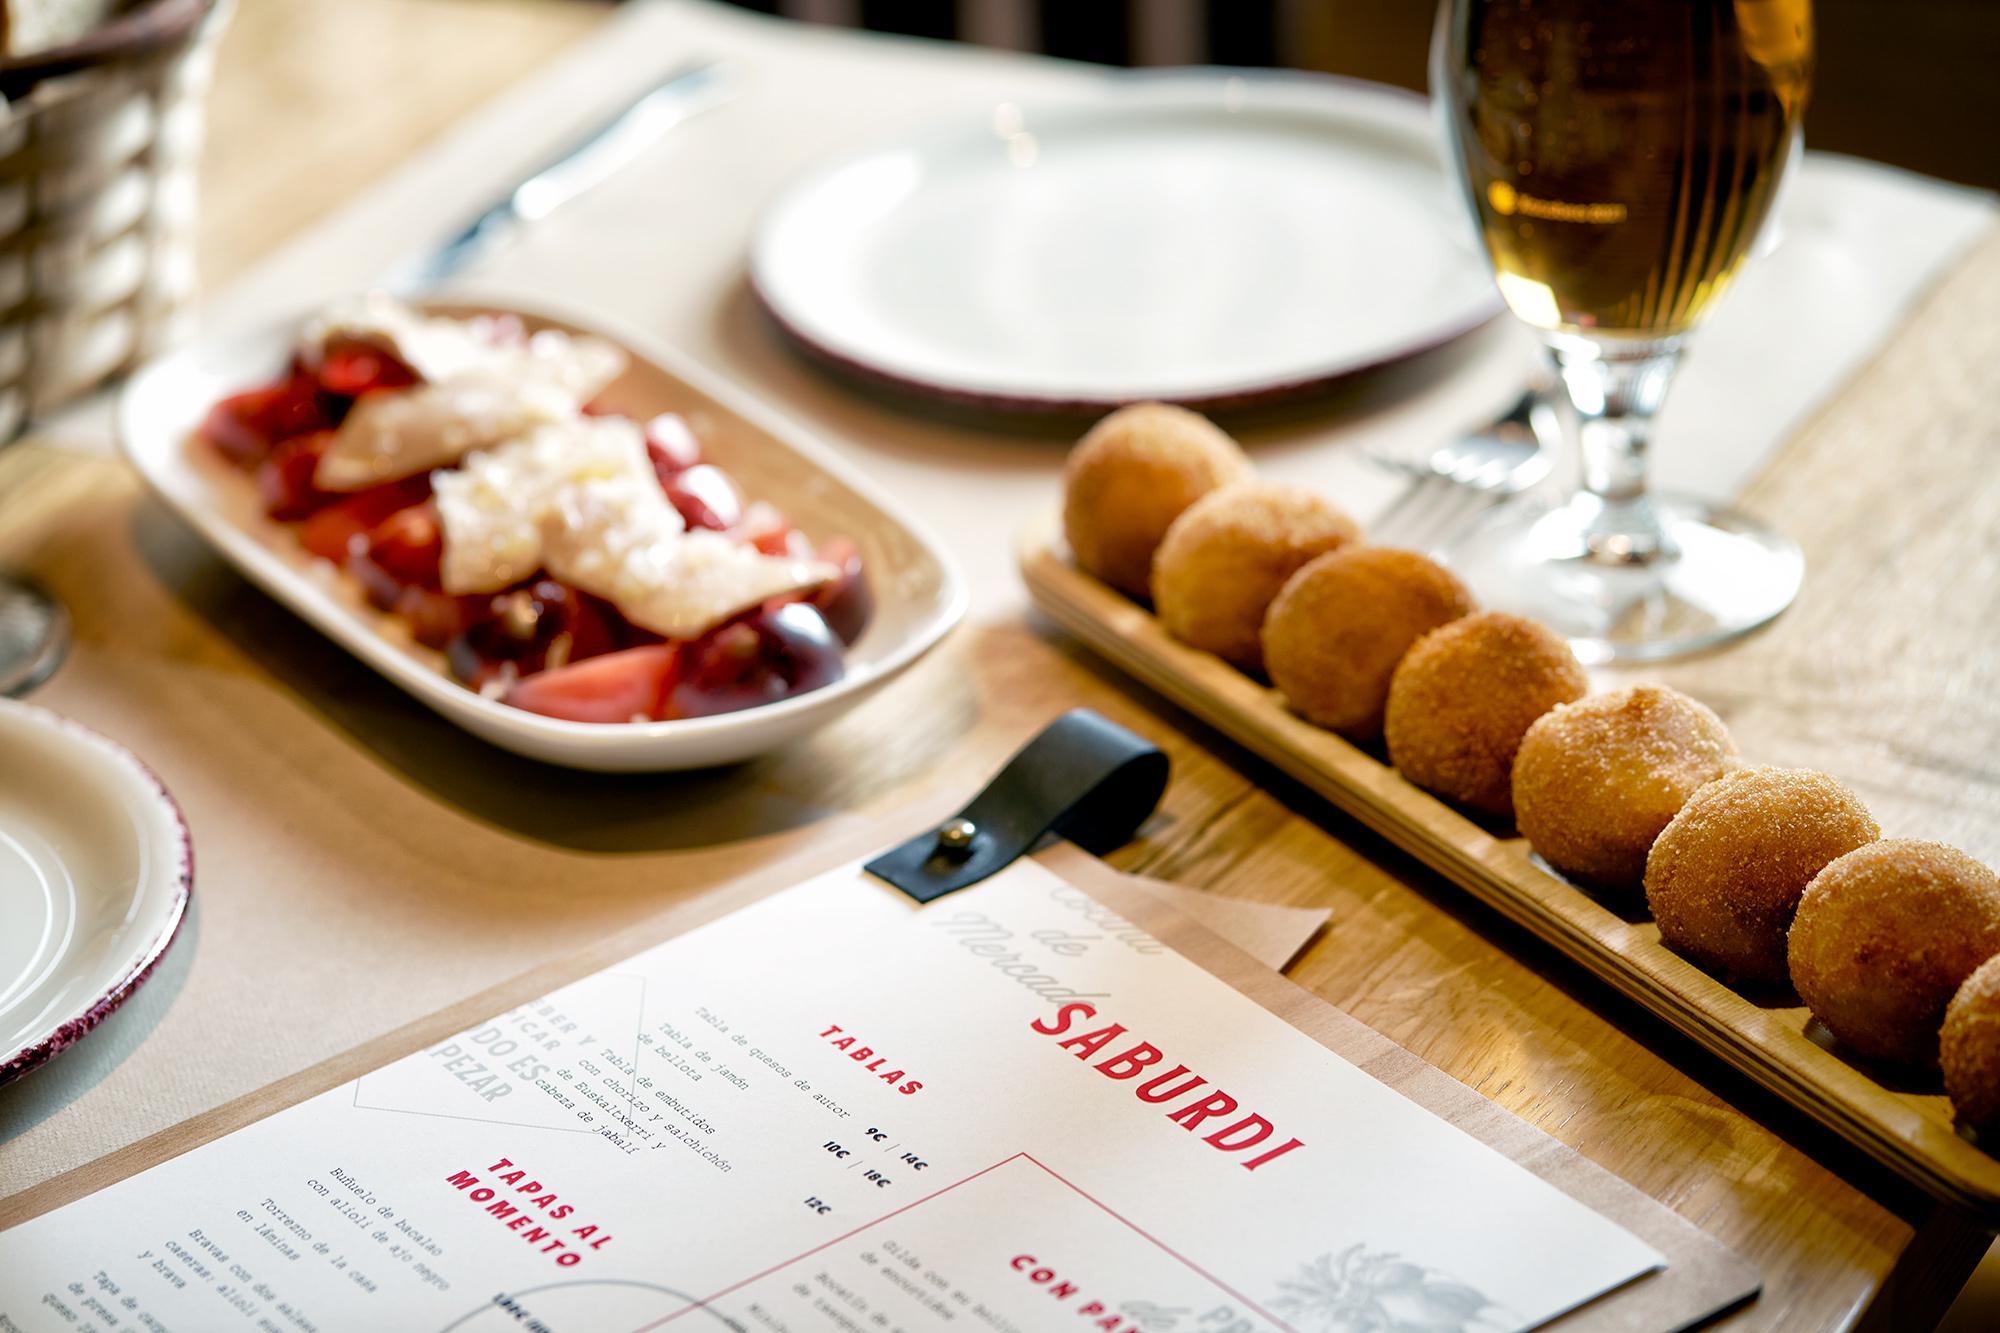 Diseño de menús para Saburdi en Vitoria-Gasteiz